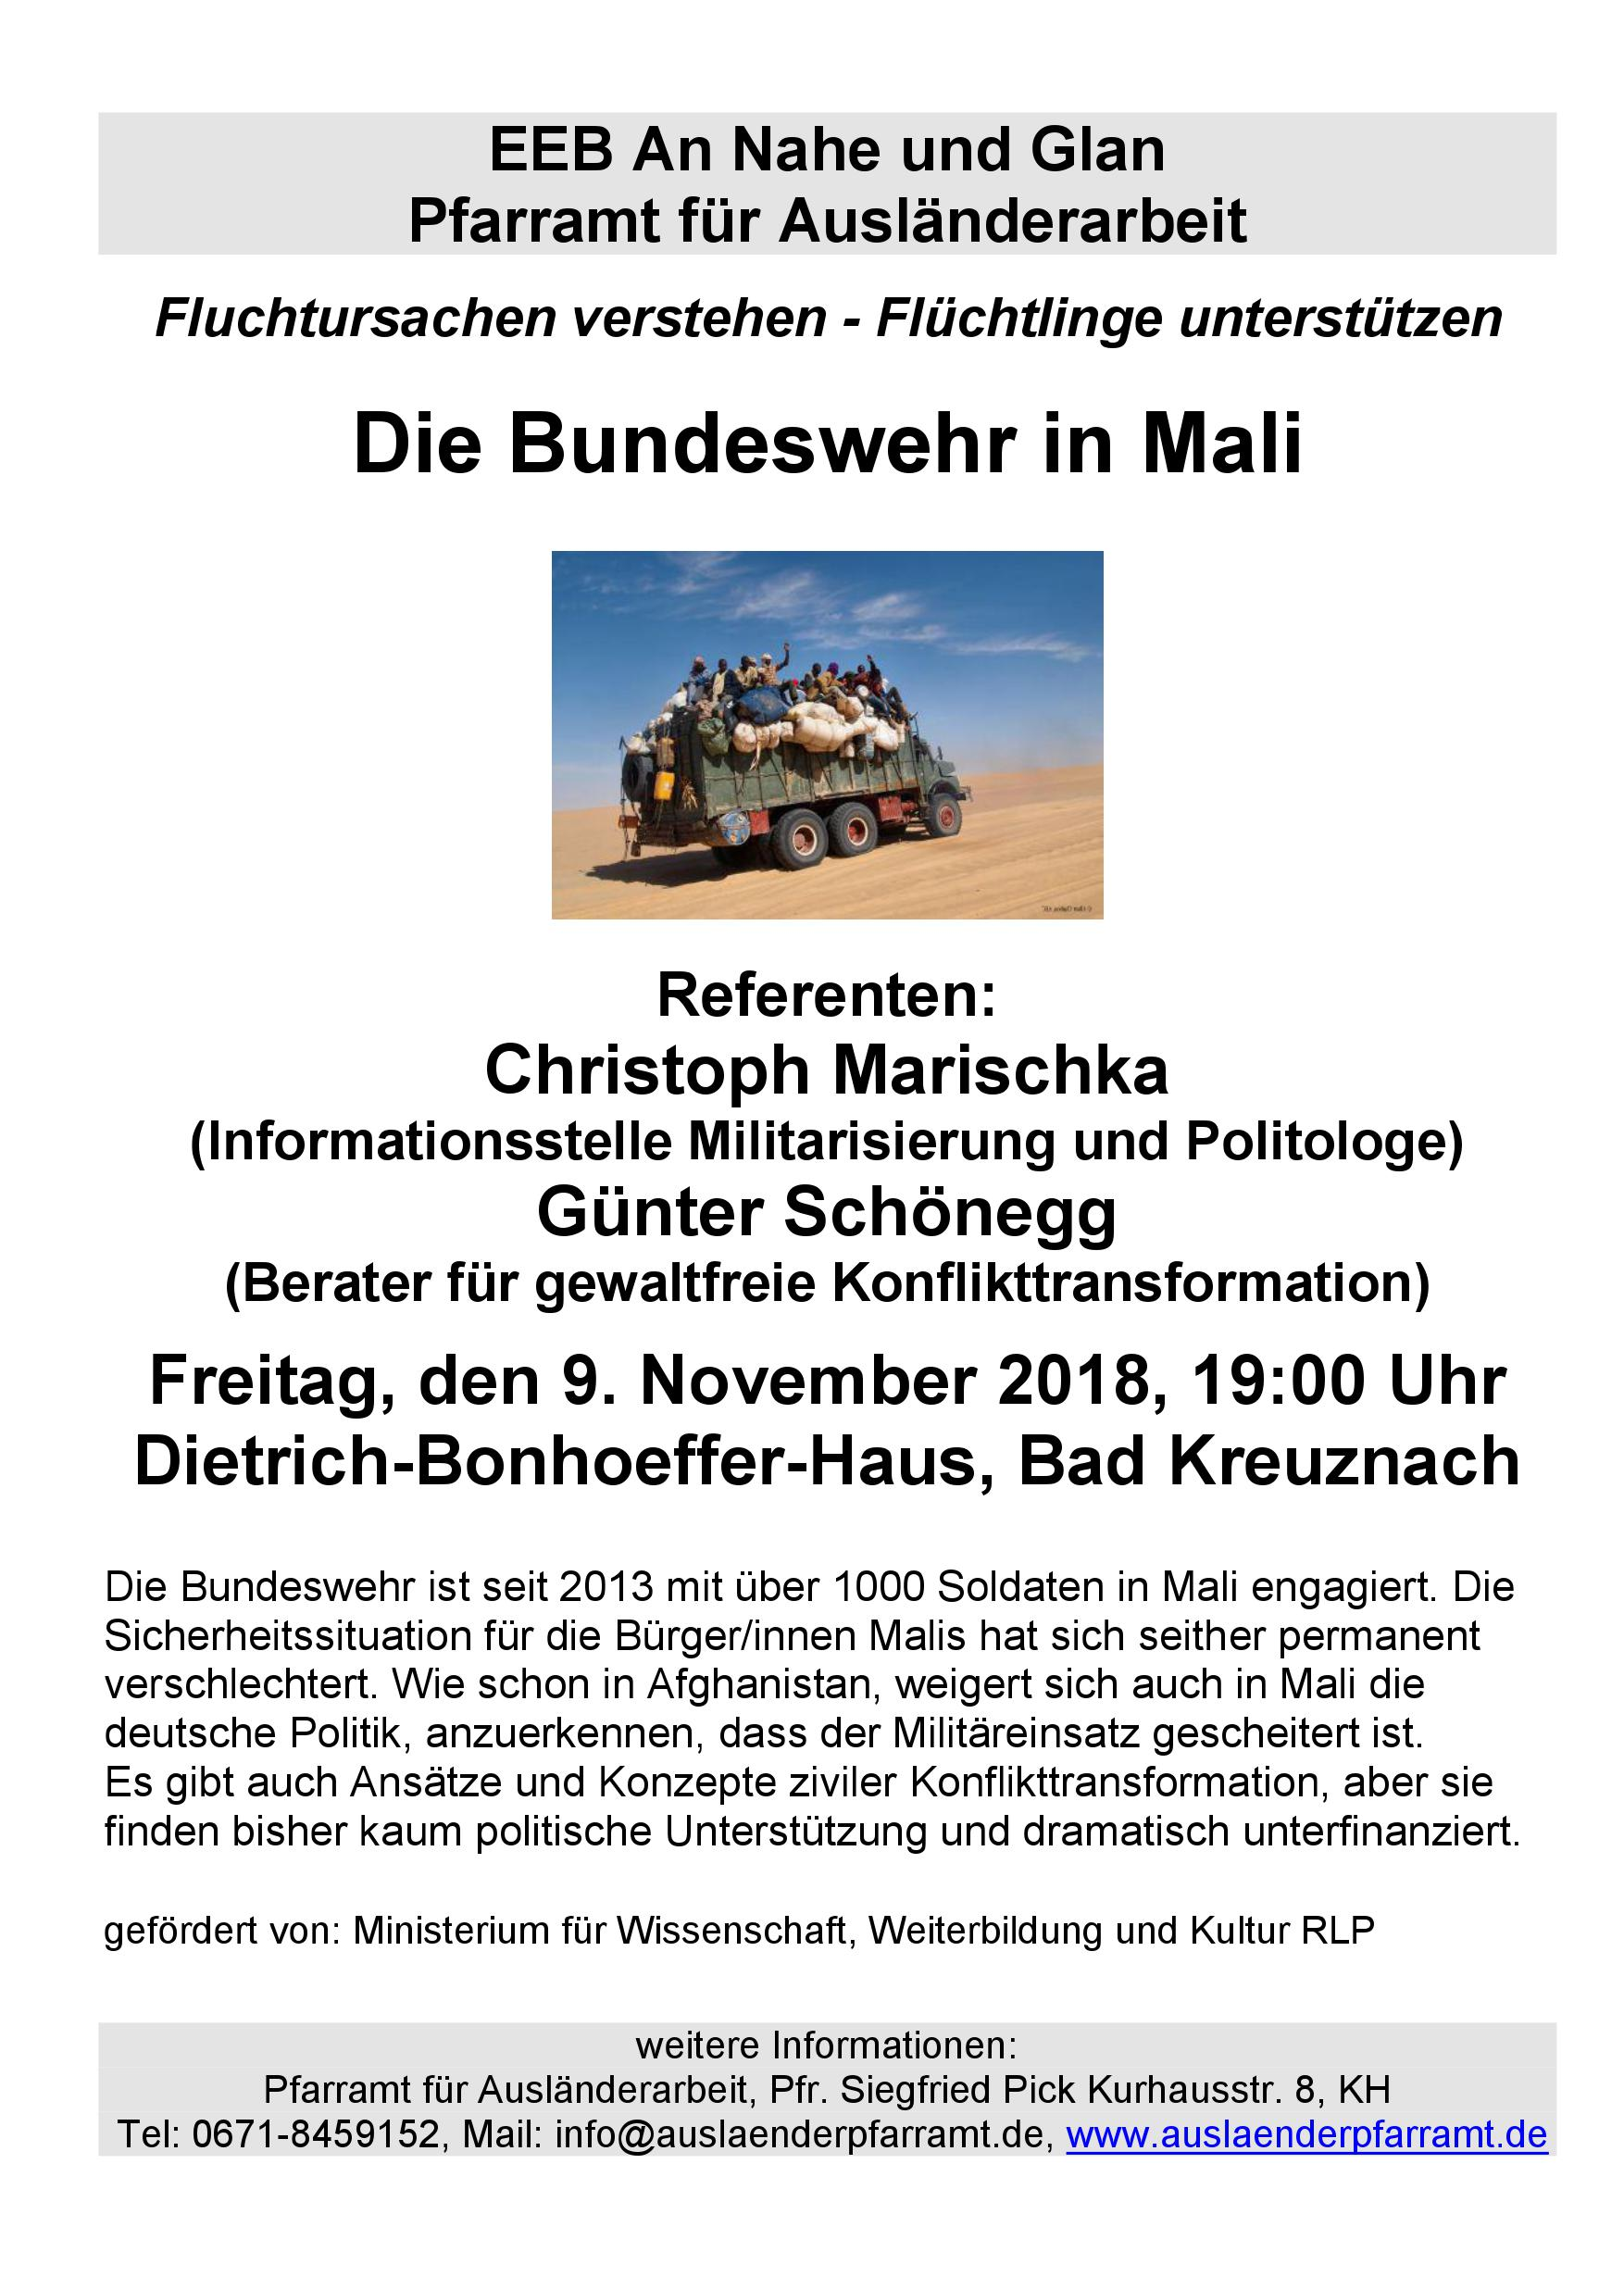 Christoph Marischka